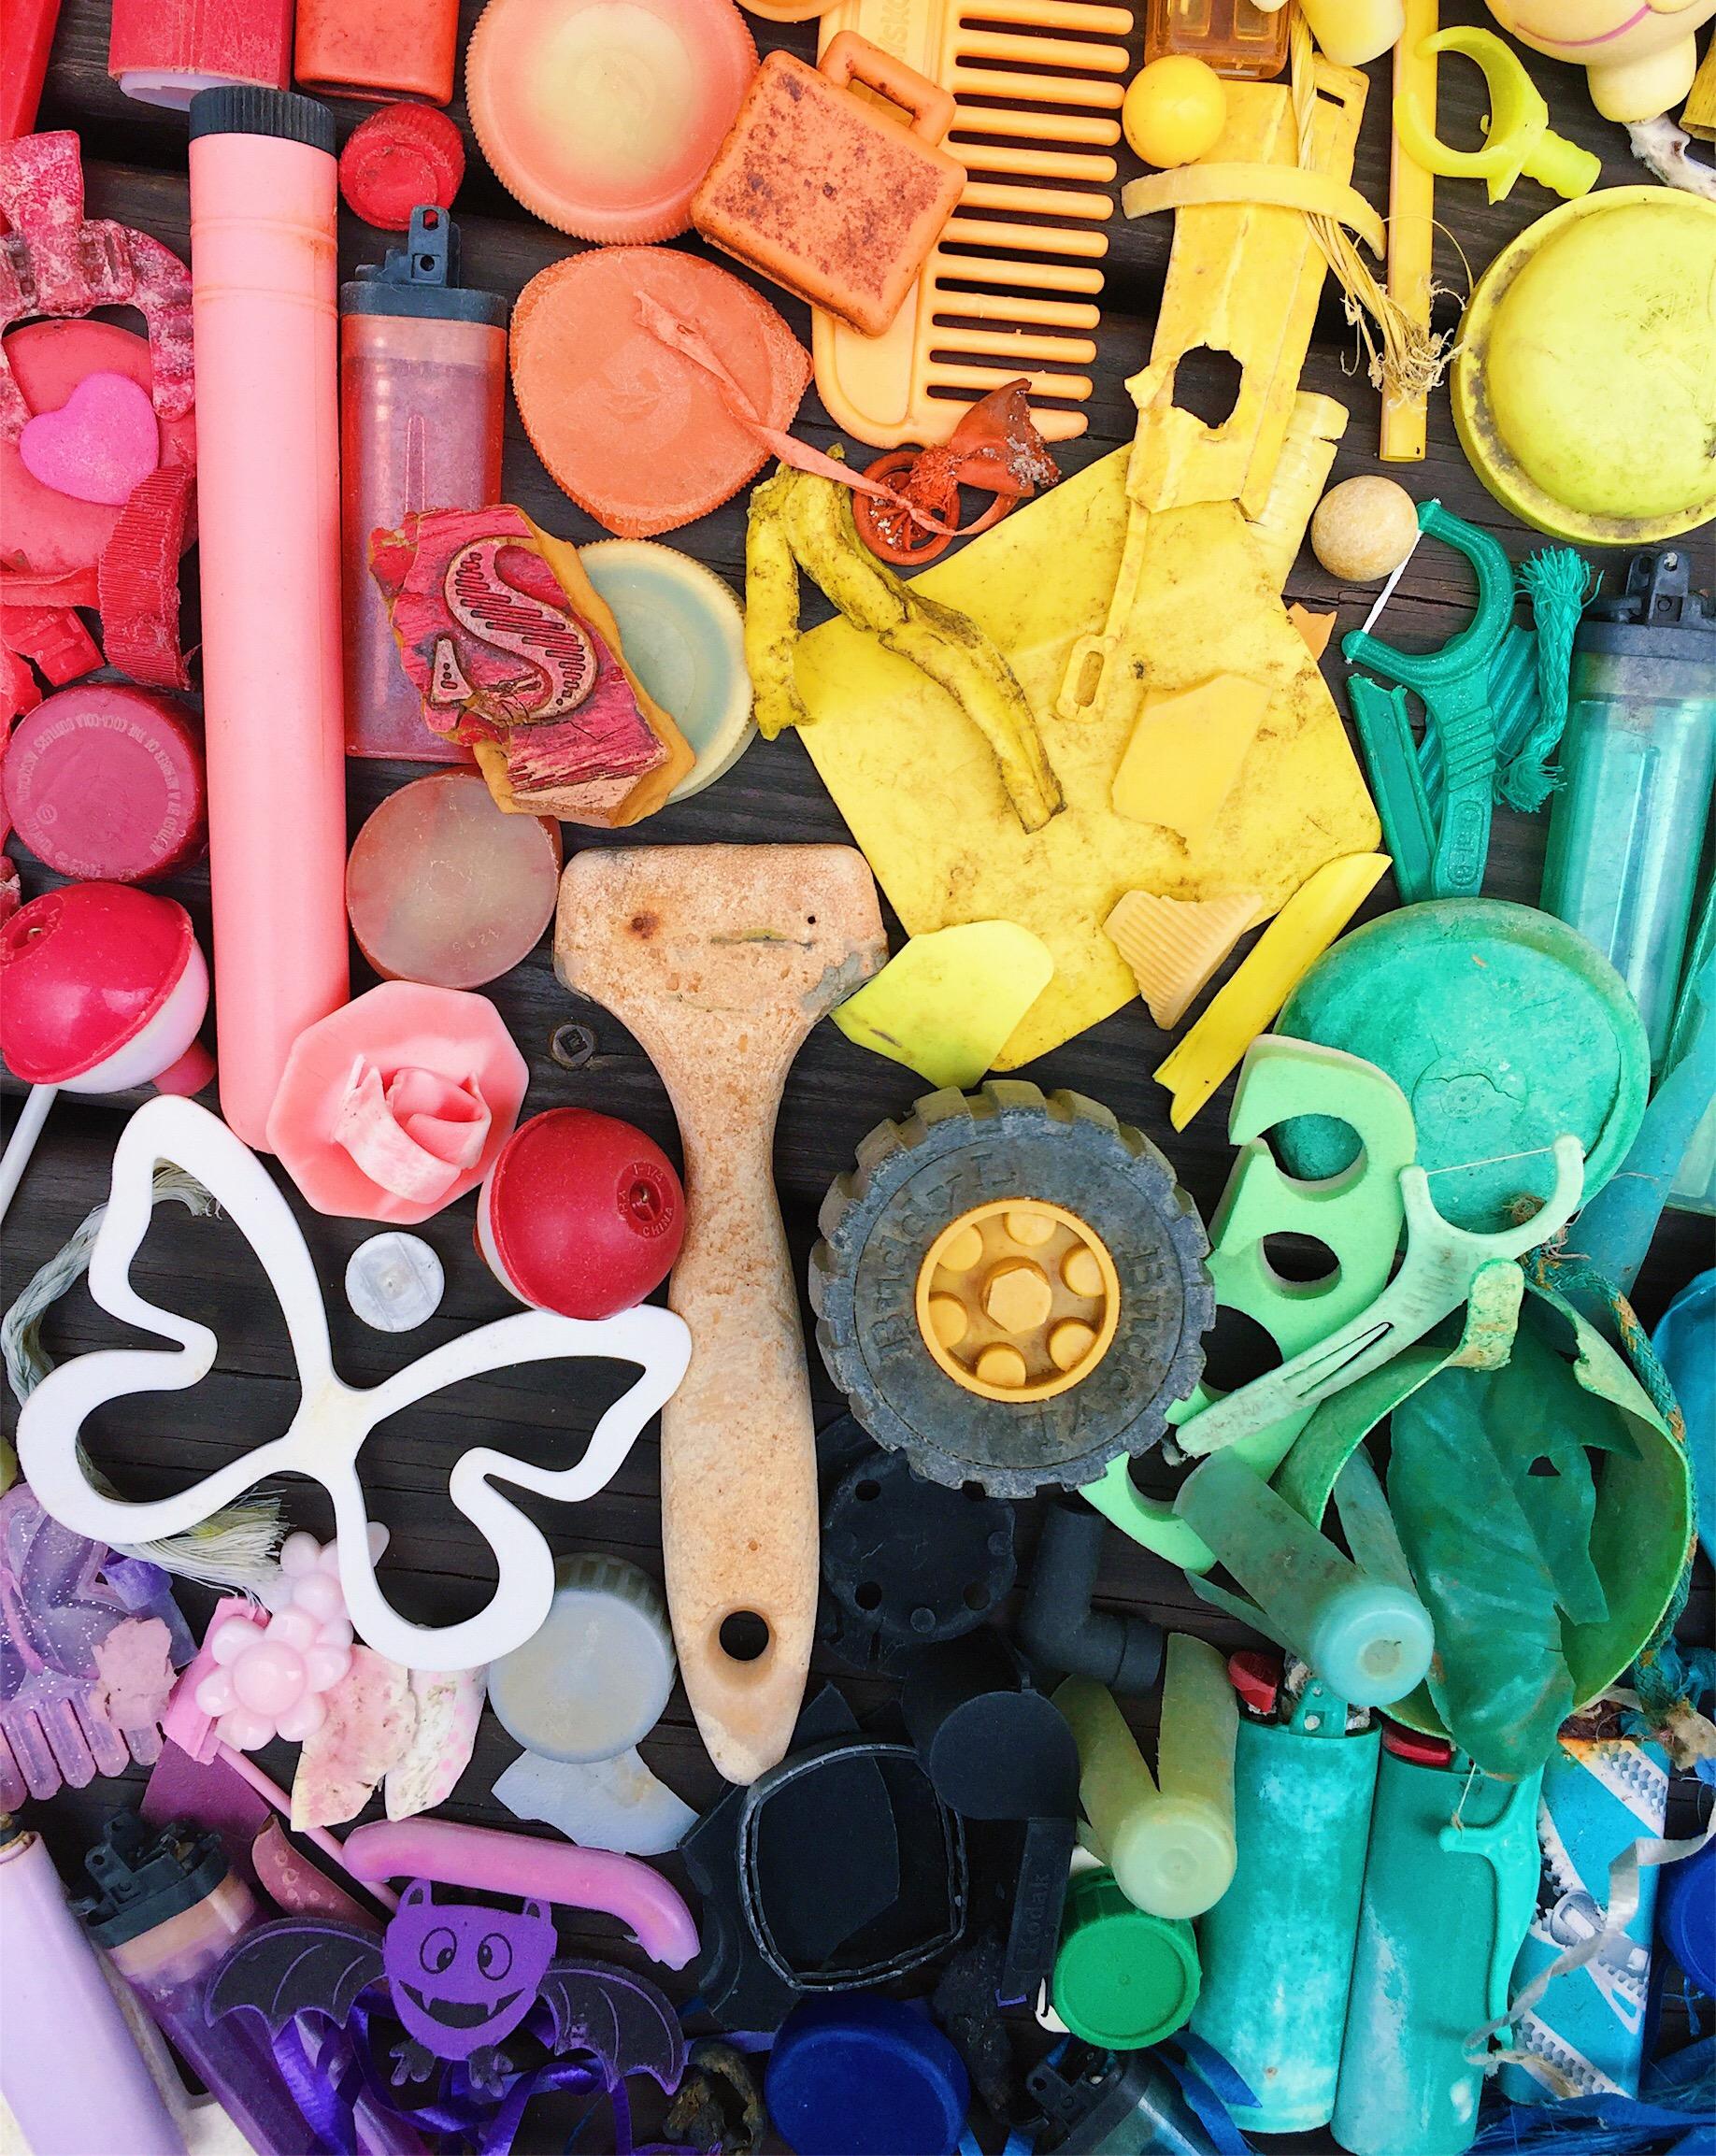 amy_chen_design_sandy_hook_beach_clean_plastic_rainbow.jpg